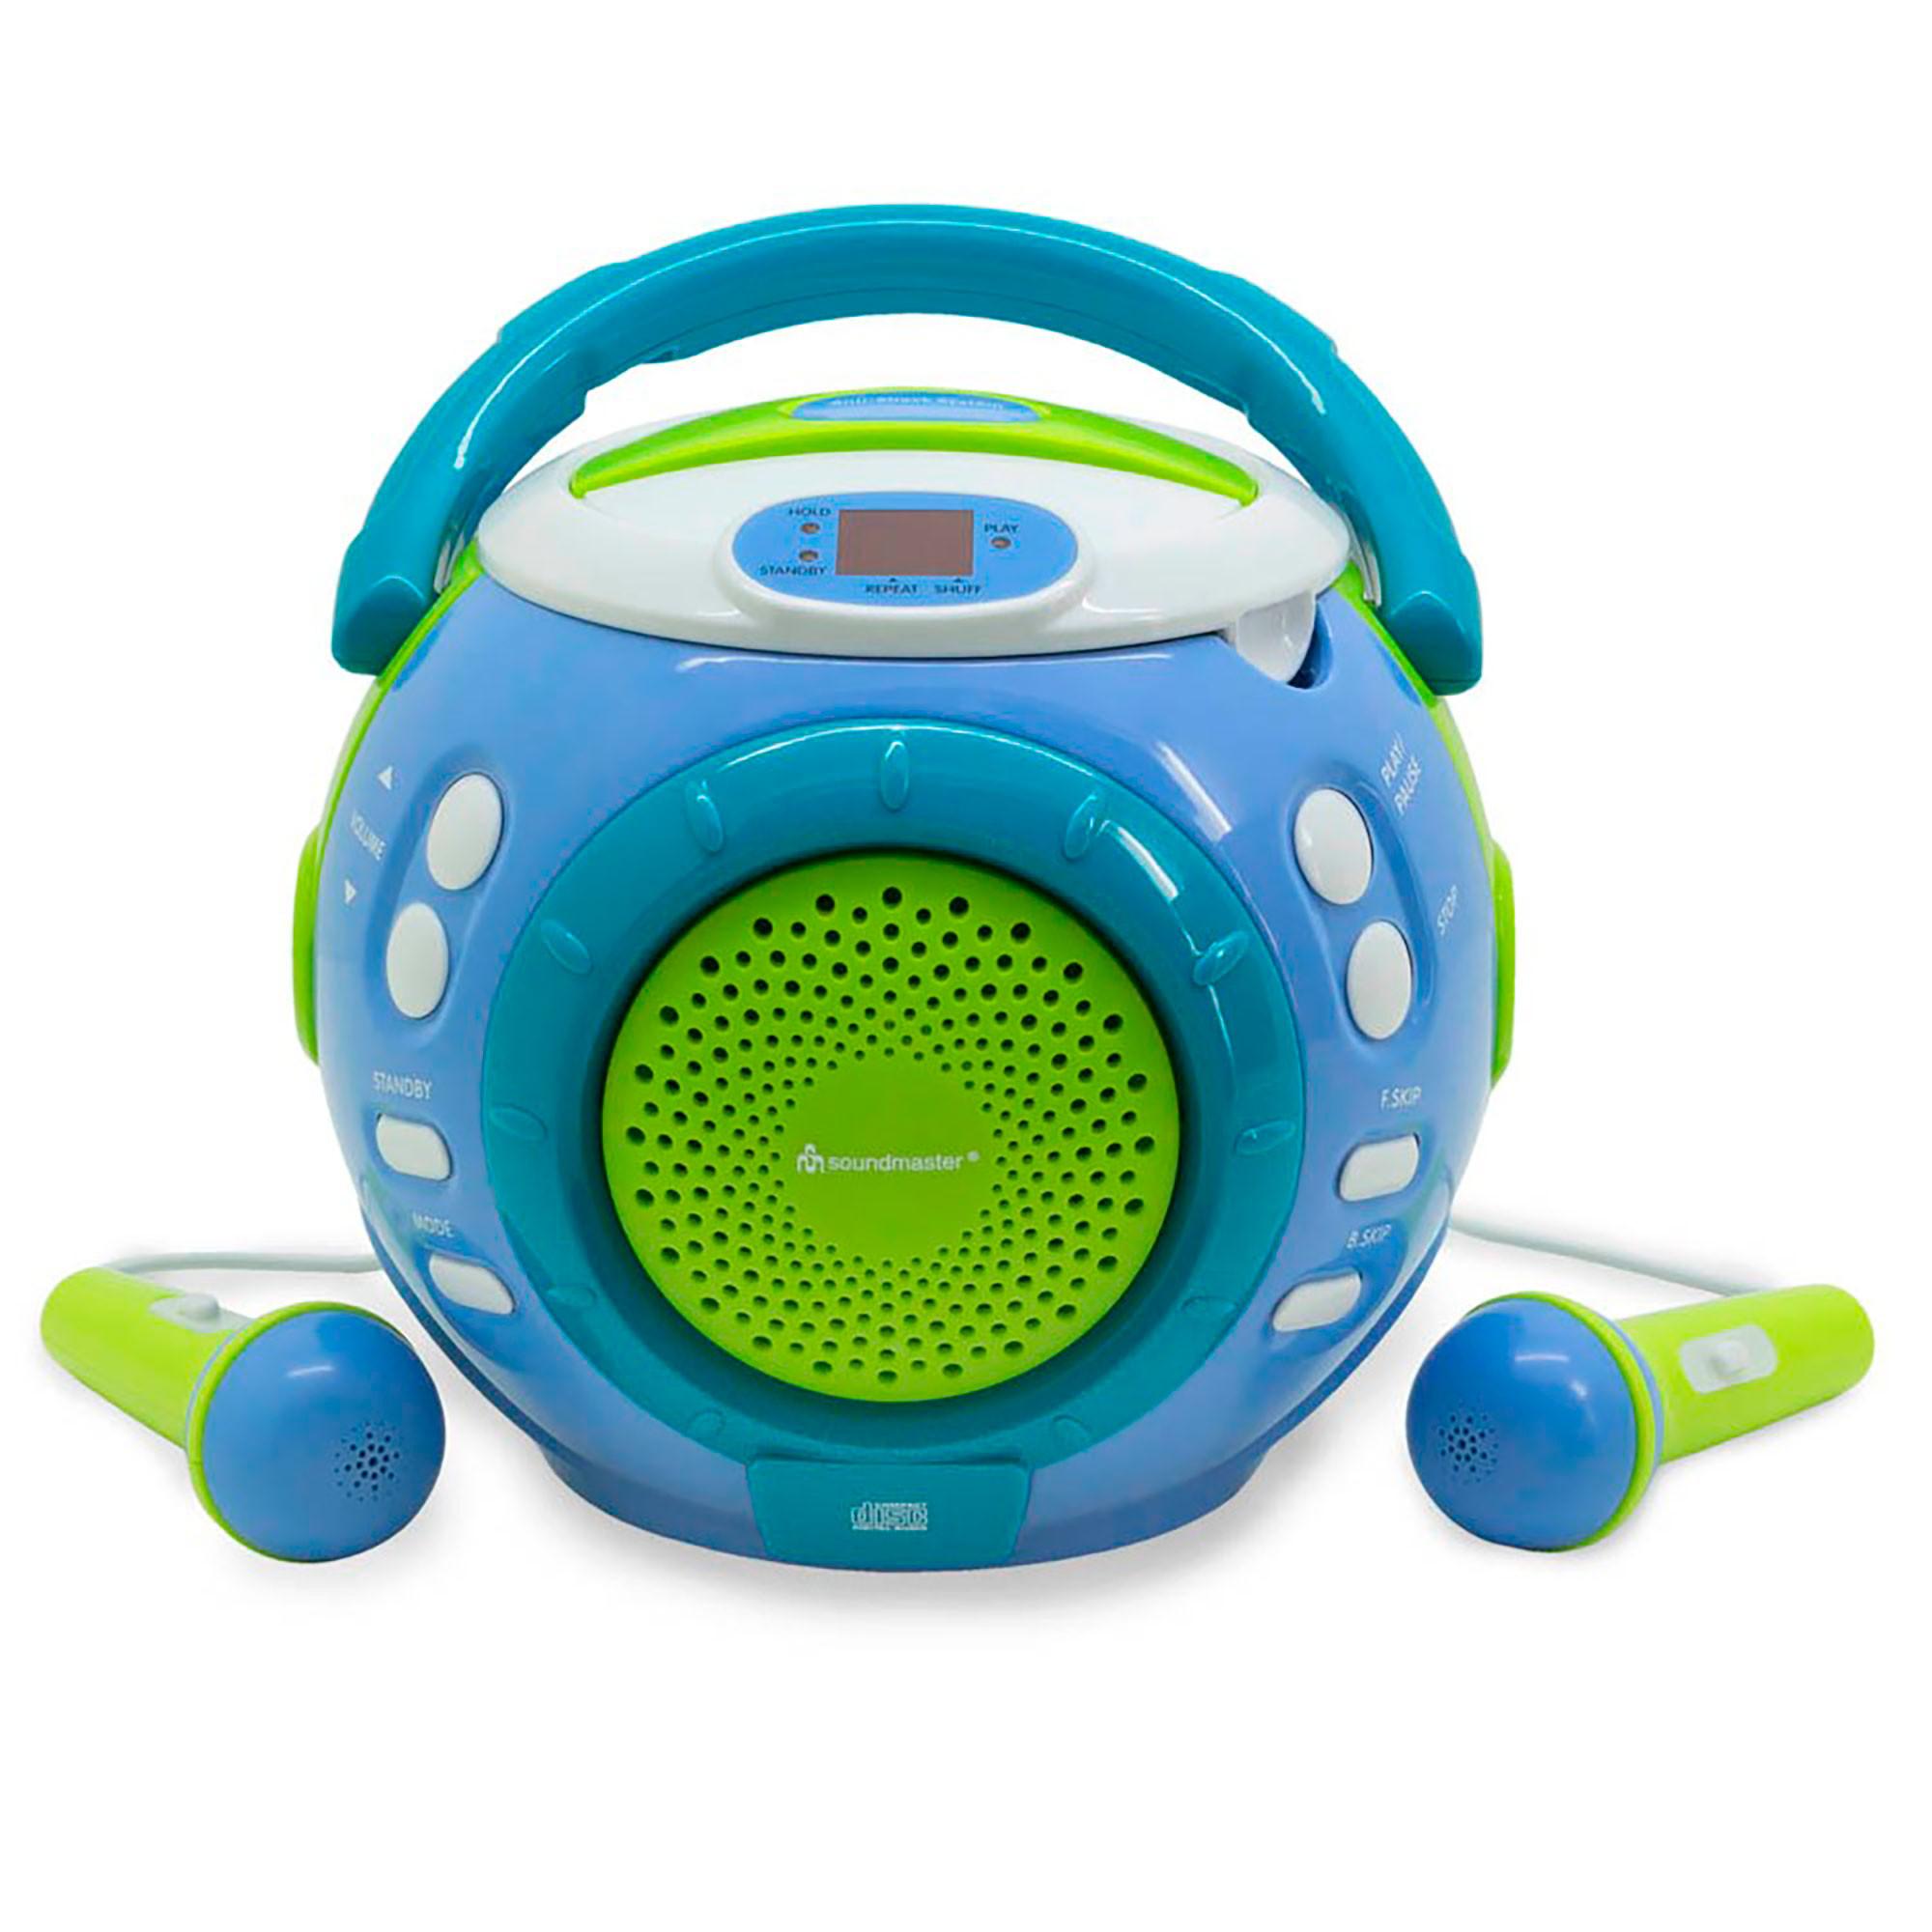 Soundmaster KCD1600BL Radio Infantil Karaoke, Reproductor CD-CDR-CDRW, 2 Micrófonos, Portátil, Azul